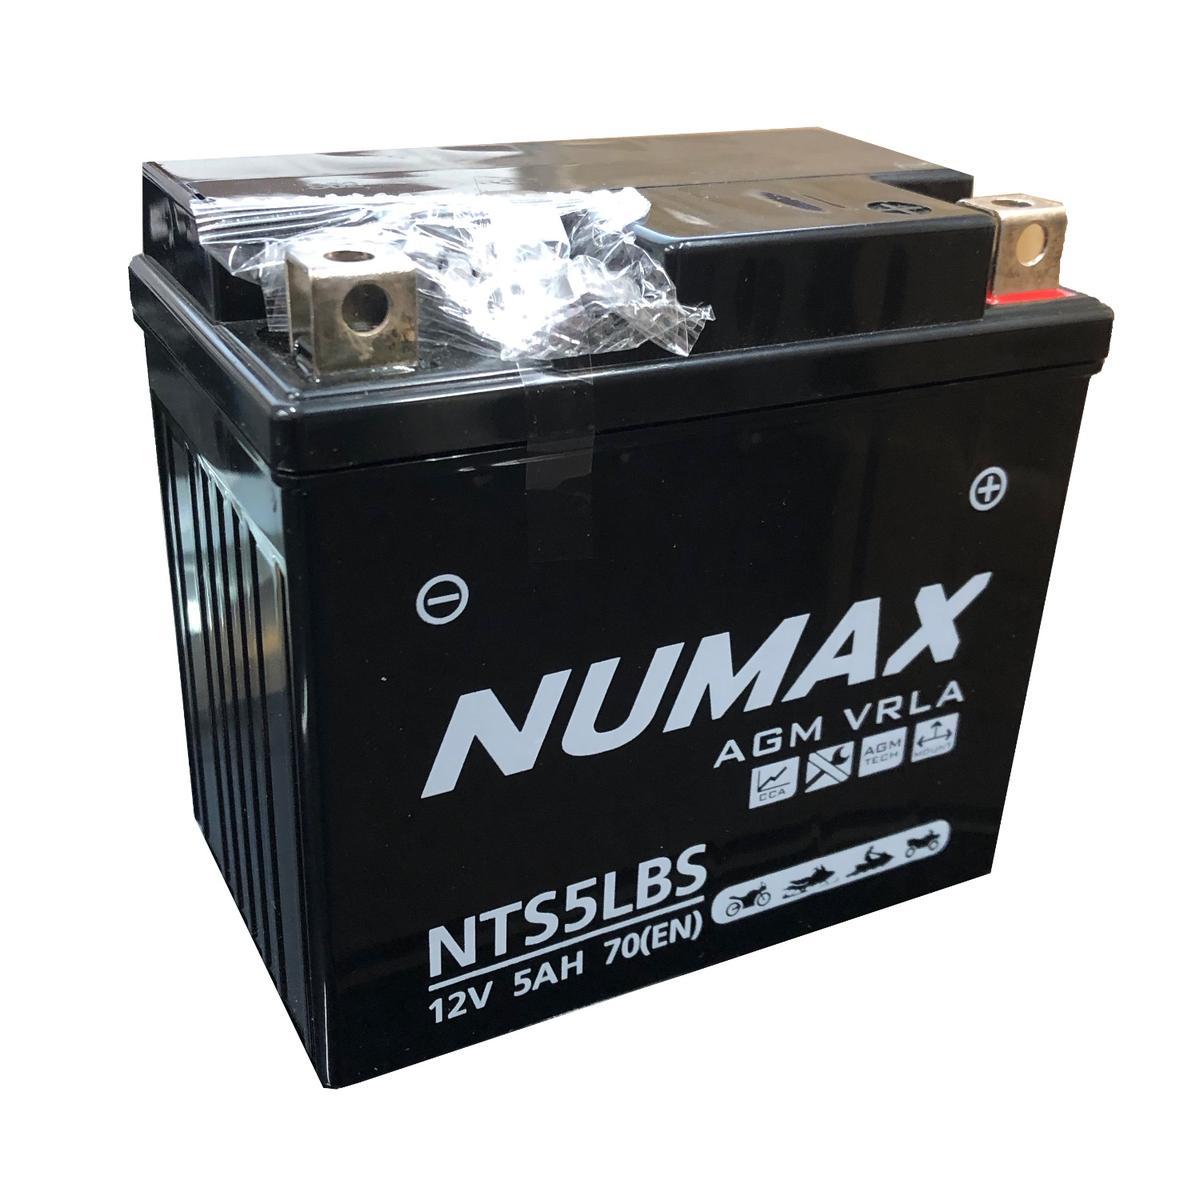 Numax 12v NTS5LBS Motorbike Bike Battery KYMCO 80cc Filly 80 YT5L-4